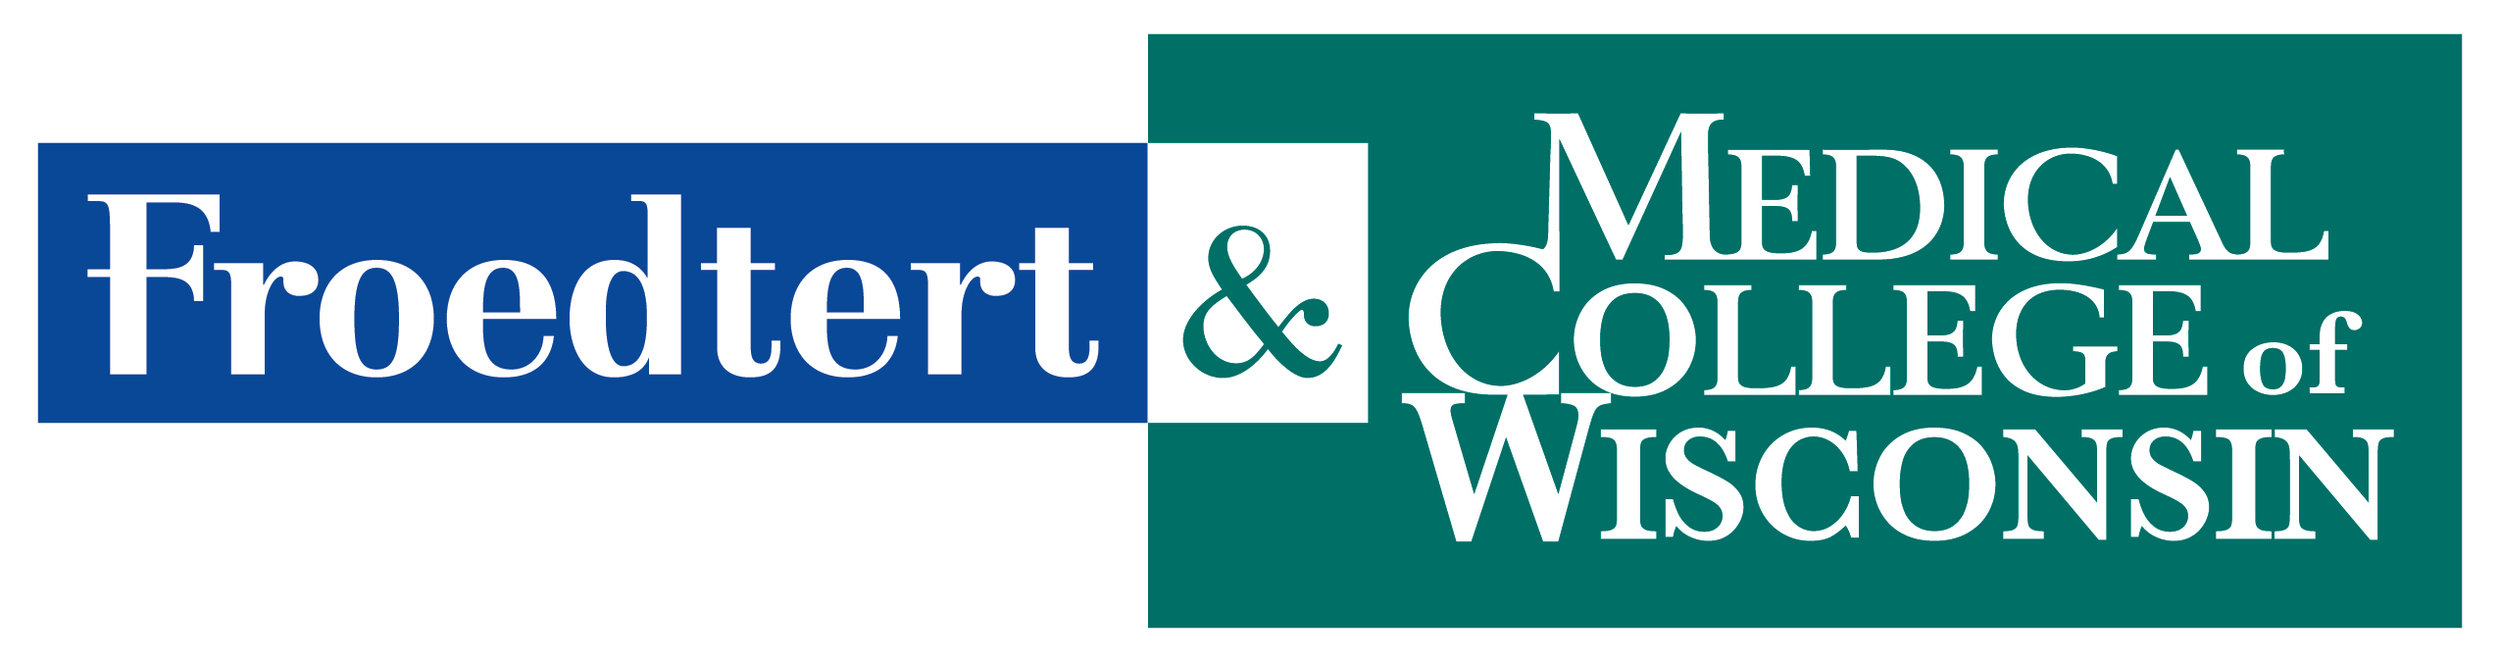 4C FMCW Logo HiRes.jpg